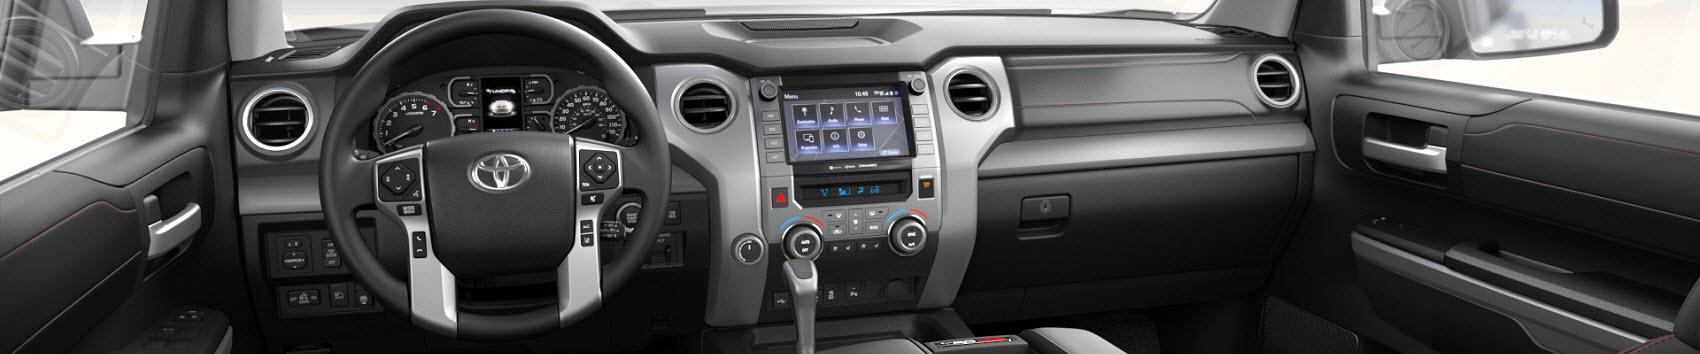 2020 Toyota Tundra Technology